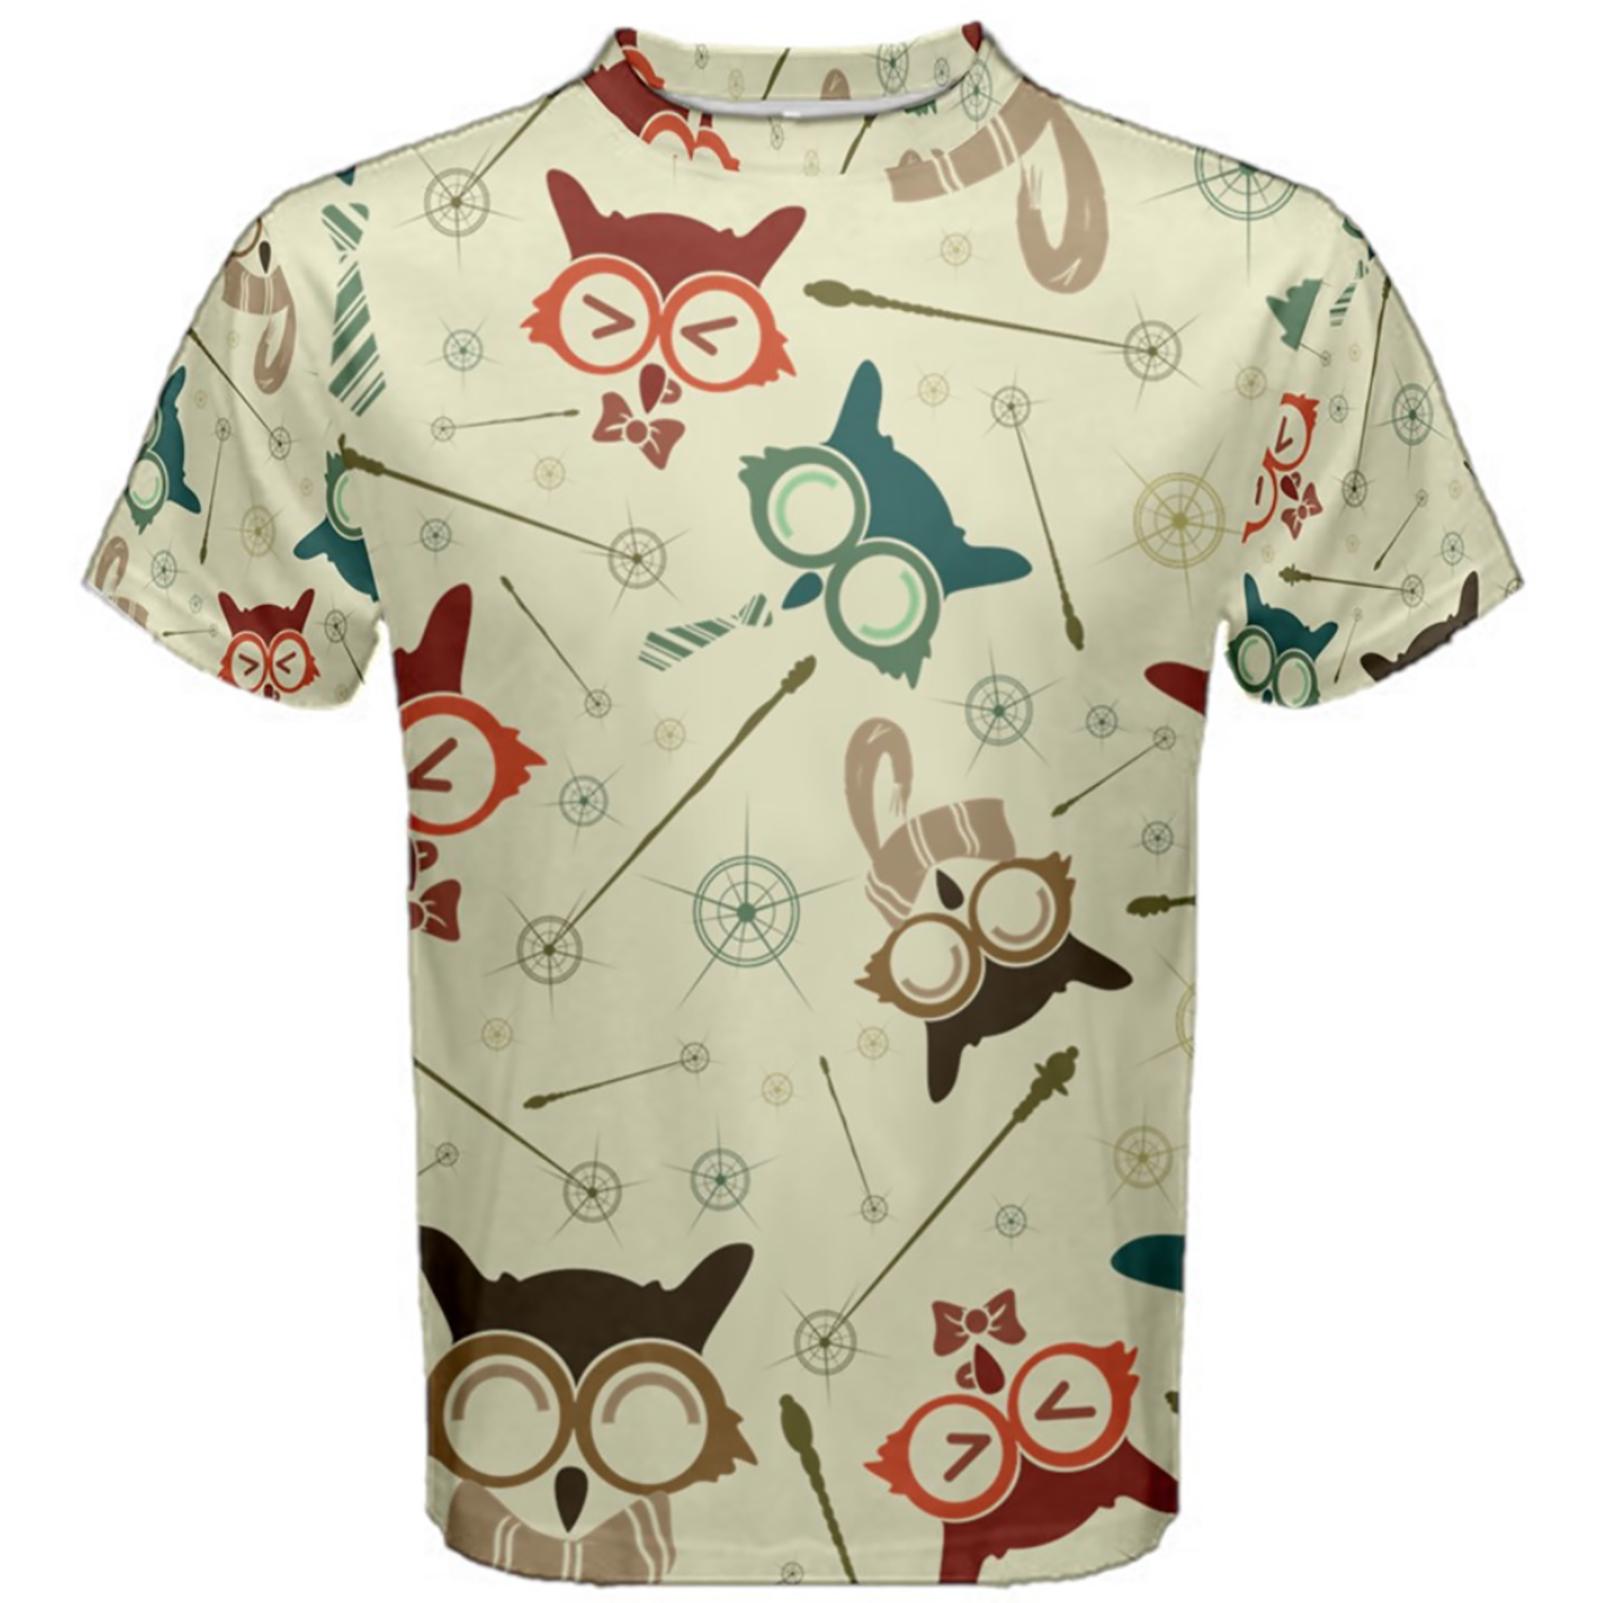 Vintage Emoji Owl Cotton Tee (Patterned)